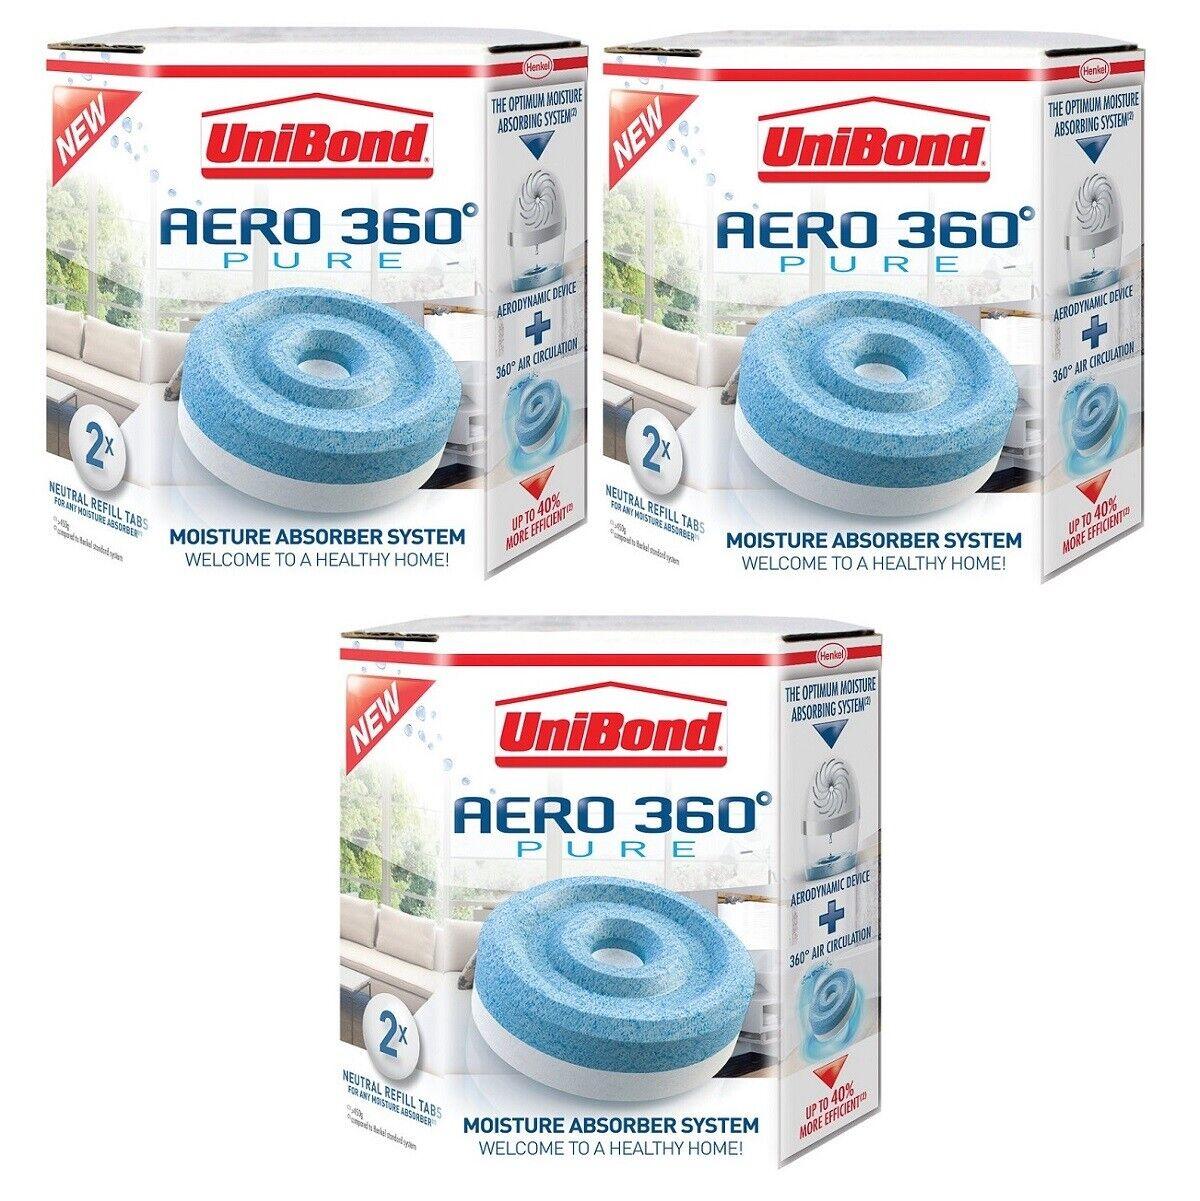 UNIBOND AERO 360 Fruit sensation//Lavender Refill Moisture Dehumidifiers